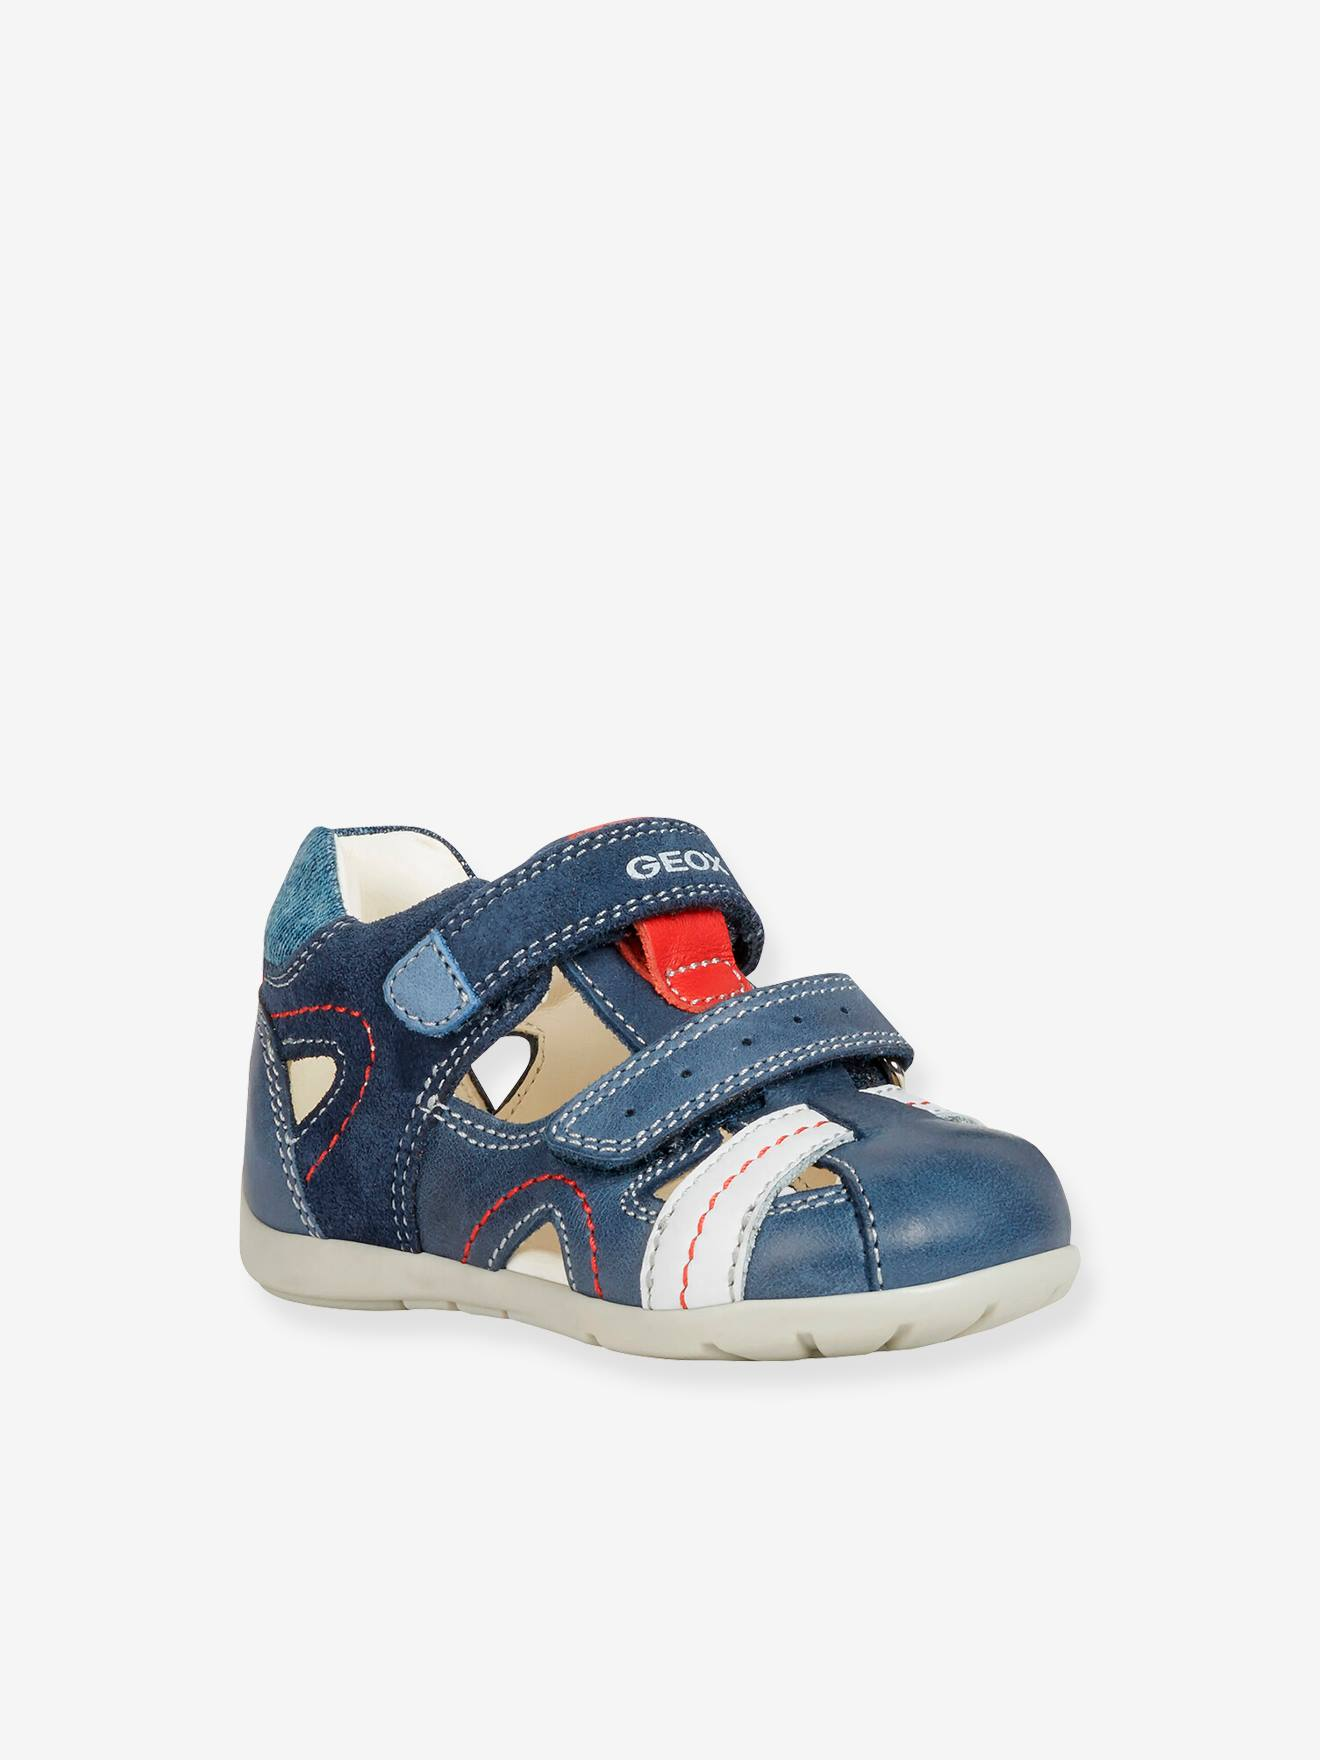 Chaussure bébé premiers pas garçon - Chaussures bébés garçons